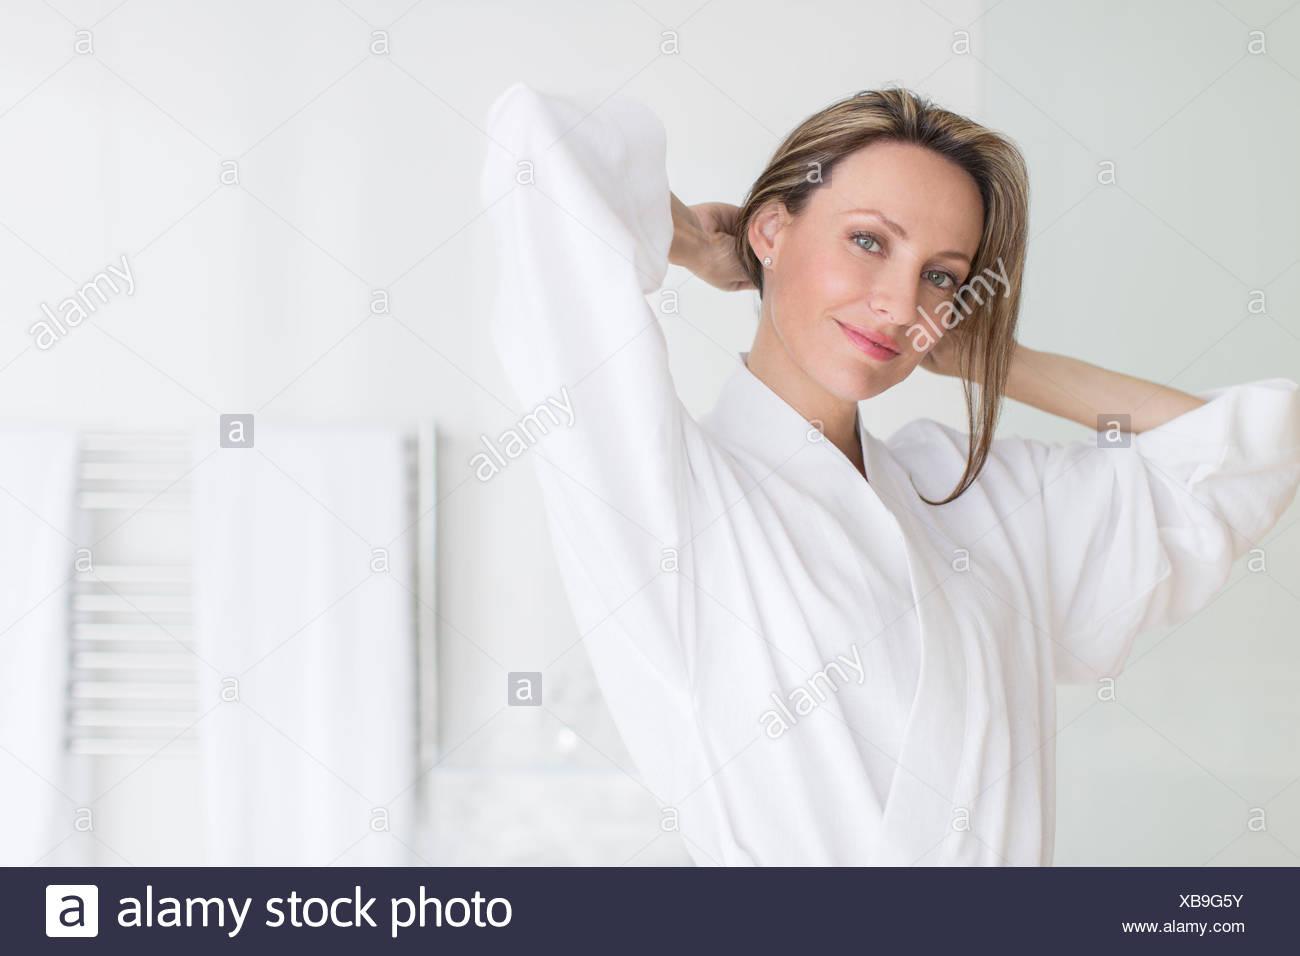 Smiling woman wearing bathrobe Photo Stock